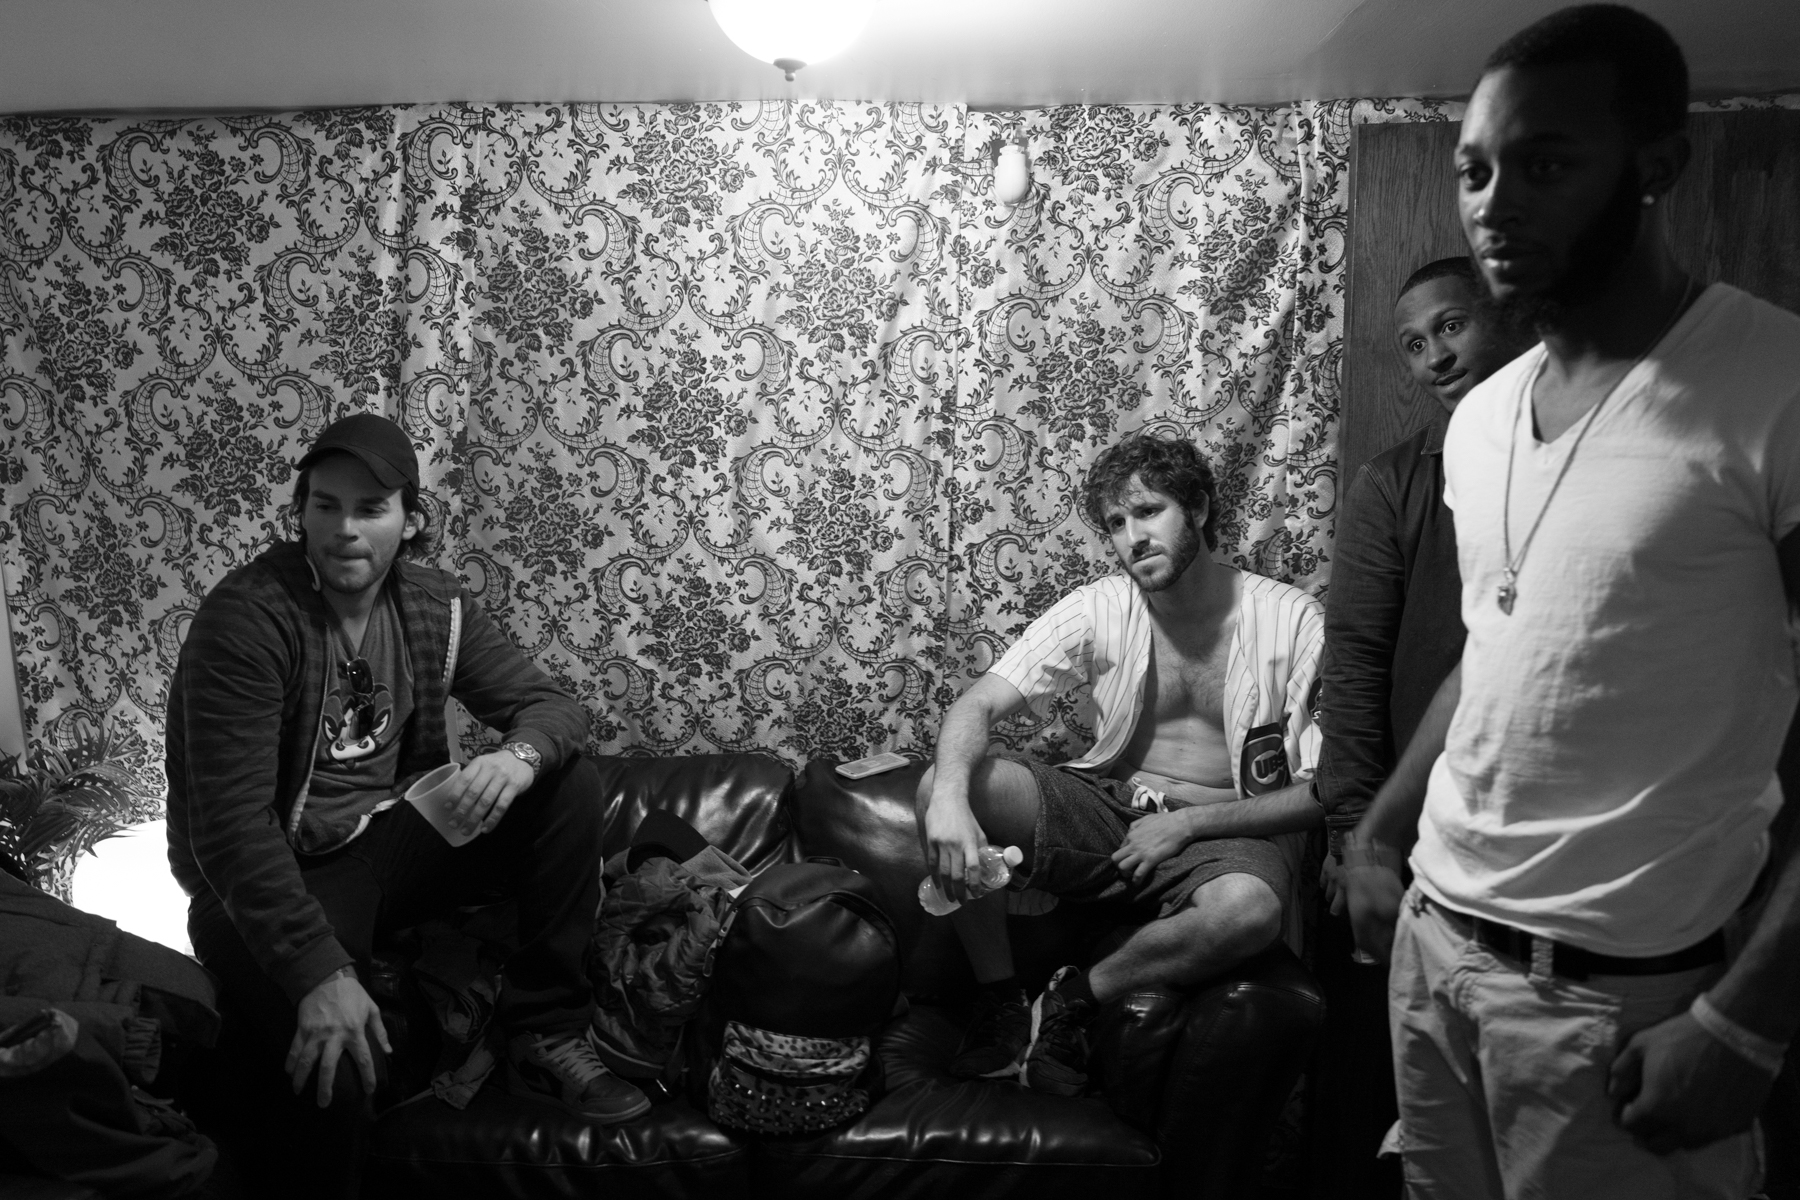 Lil Di  cky Backstage.  Leica Q.                                   Copyright of   Nicholas Pinto 2016